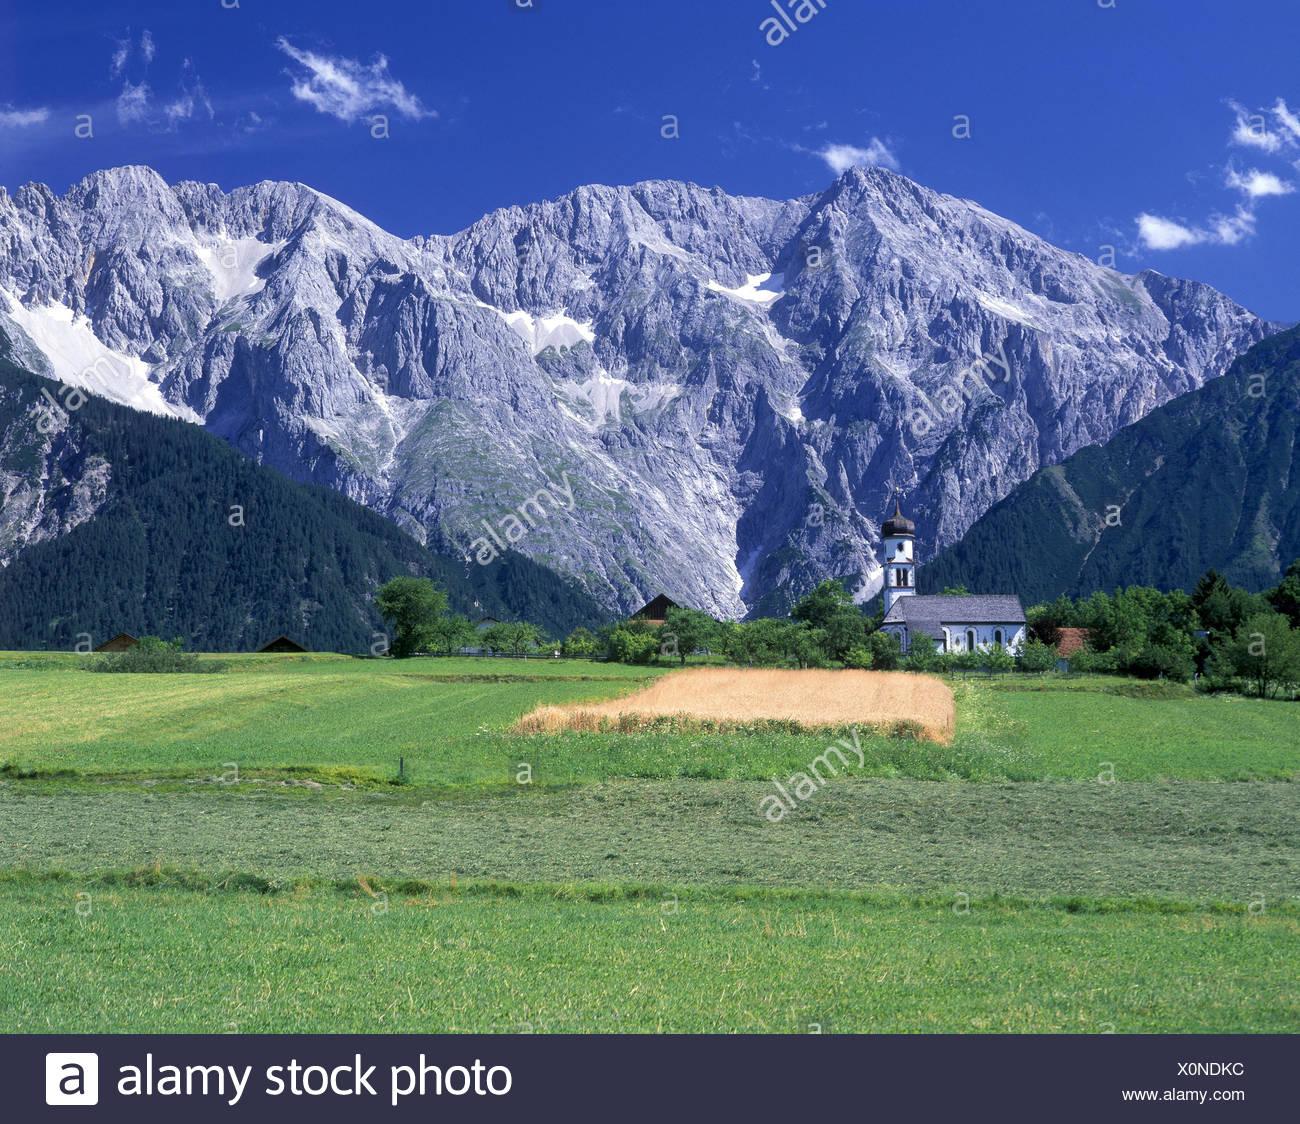 Austria, Tirolo, St. Anton in montagna Arl, lago di cartello contro Küchelspitze e Faselfadspitzen, Immagini Stock